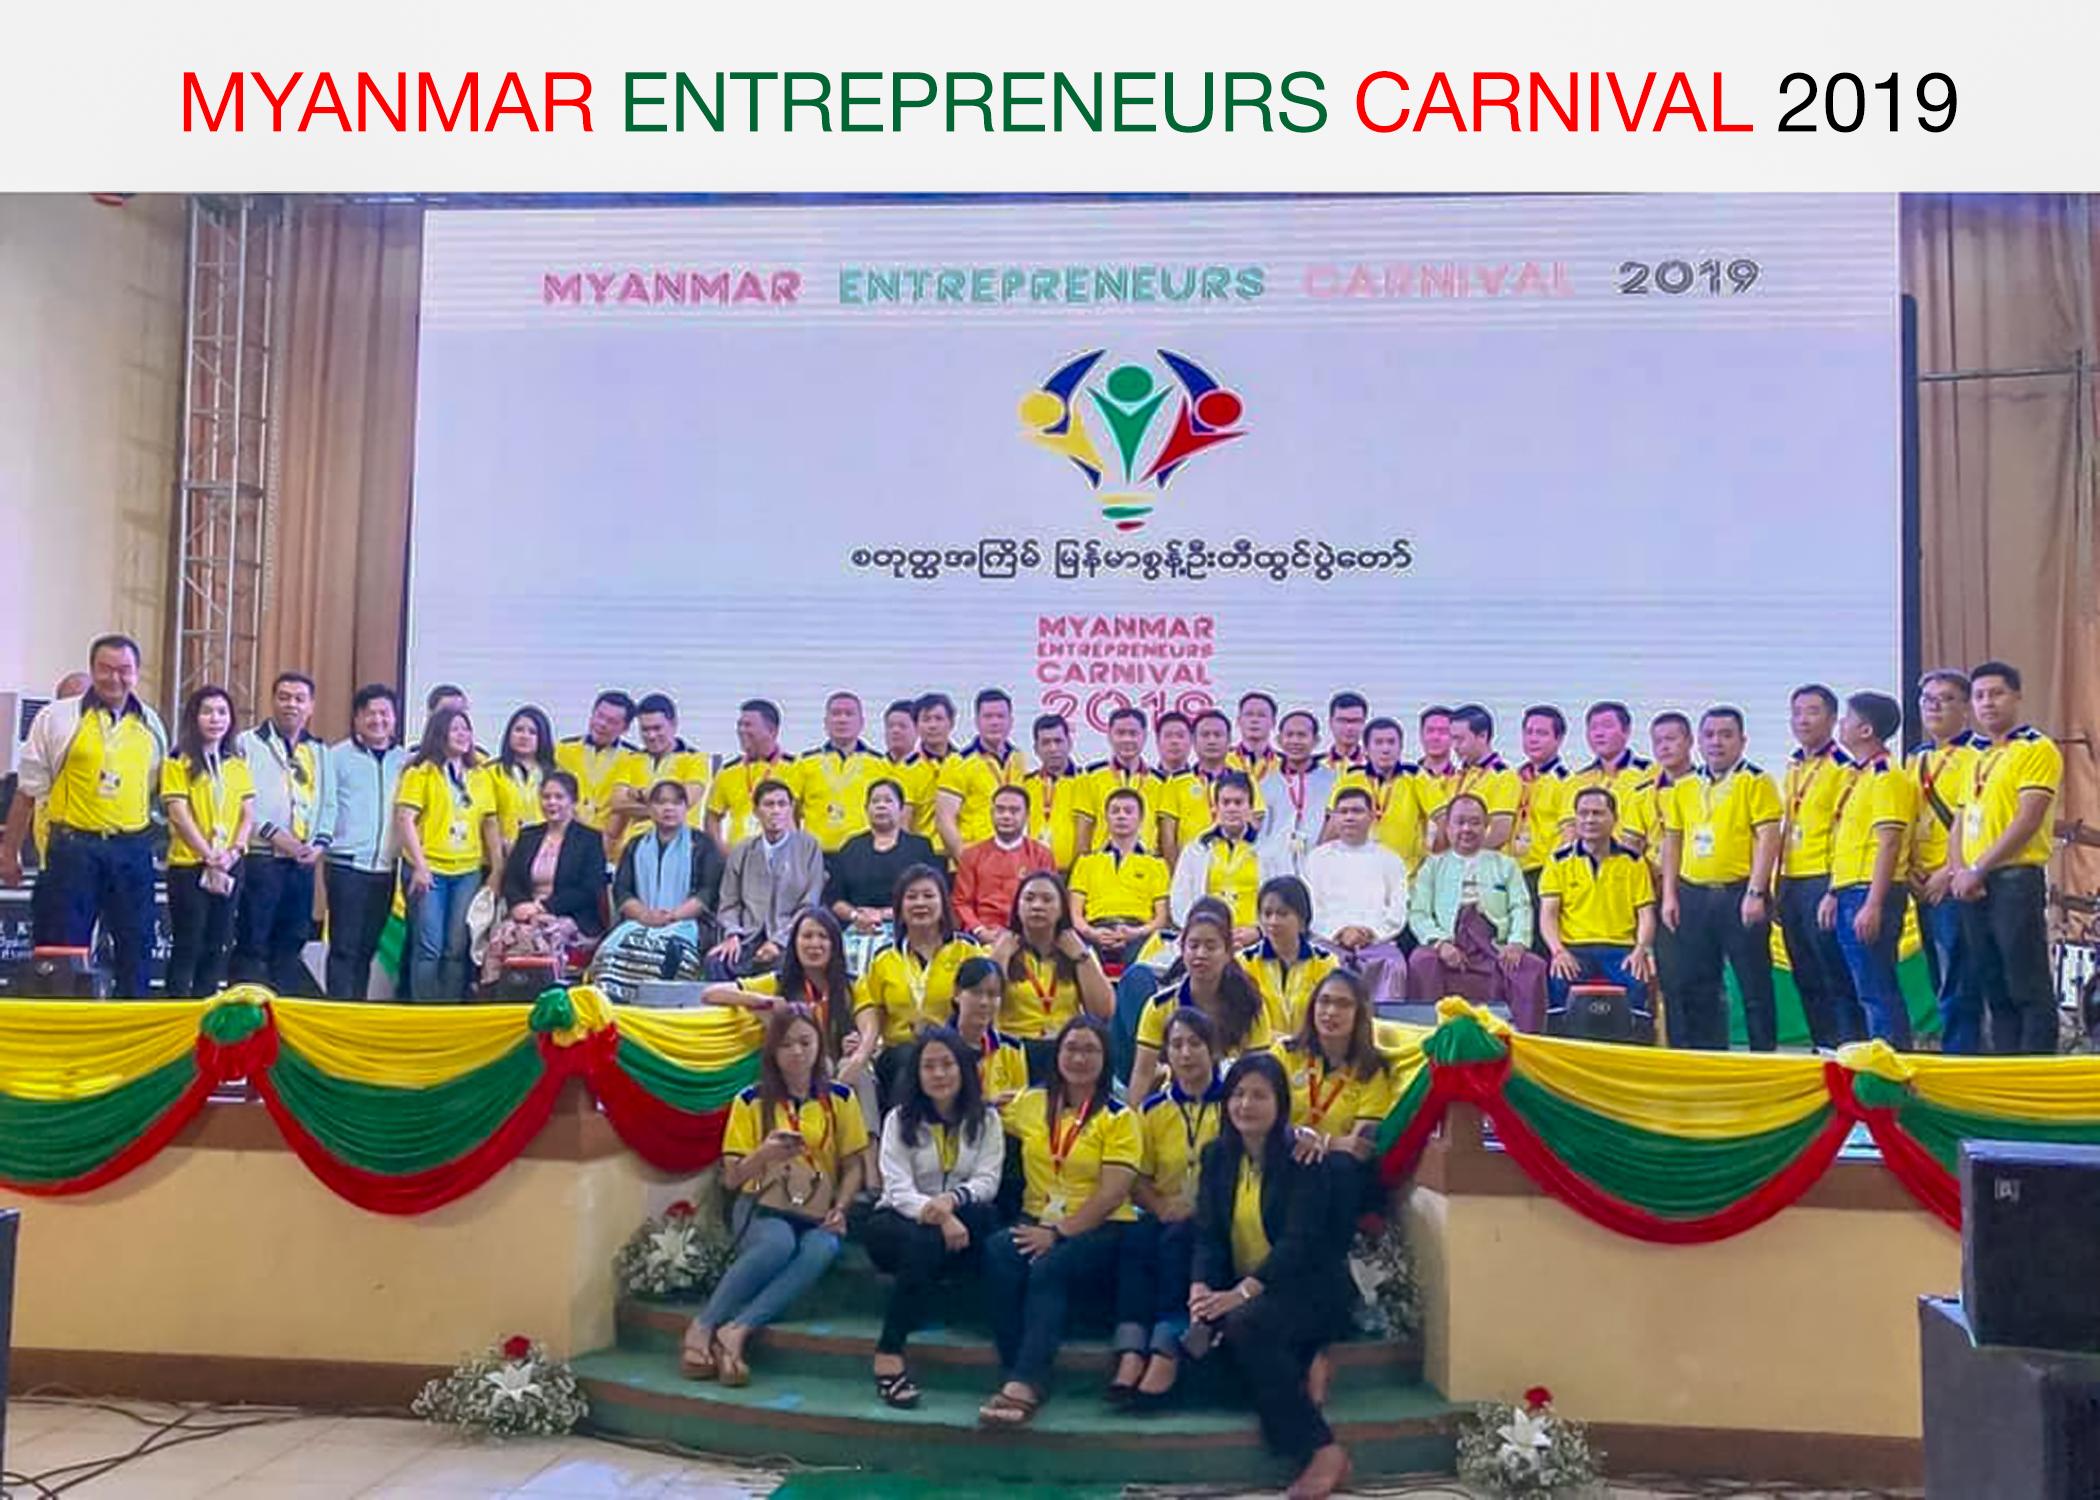 Setra Booth @ 4th Myanmar Entrepreneurs Carnival 2019